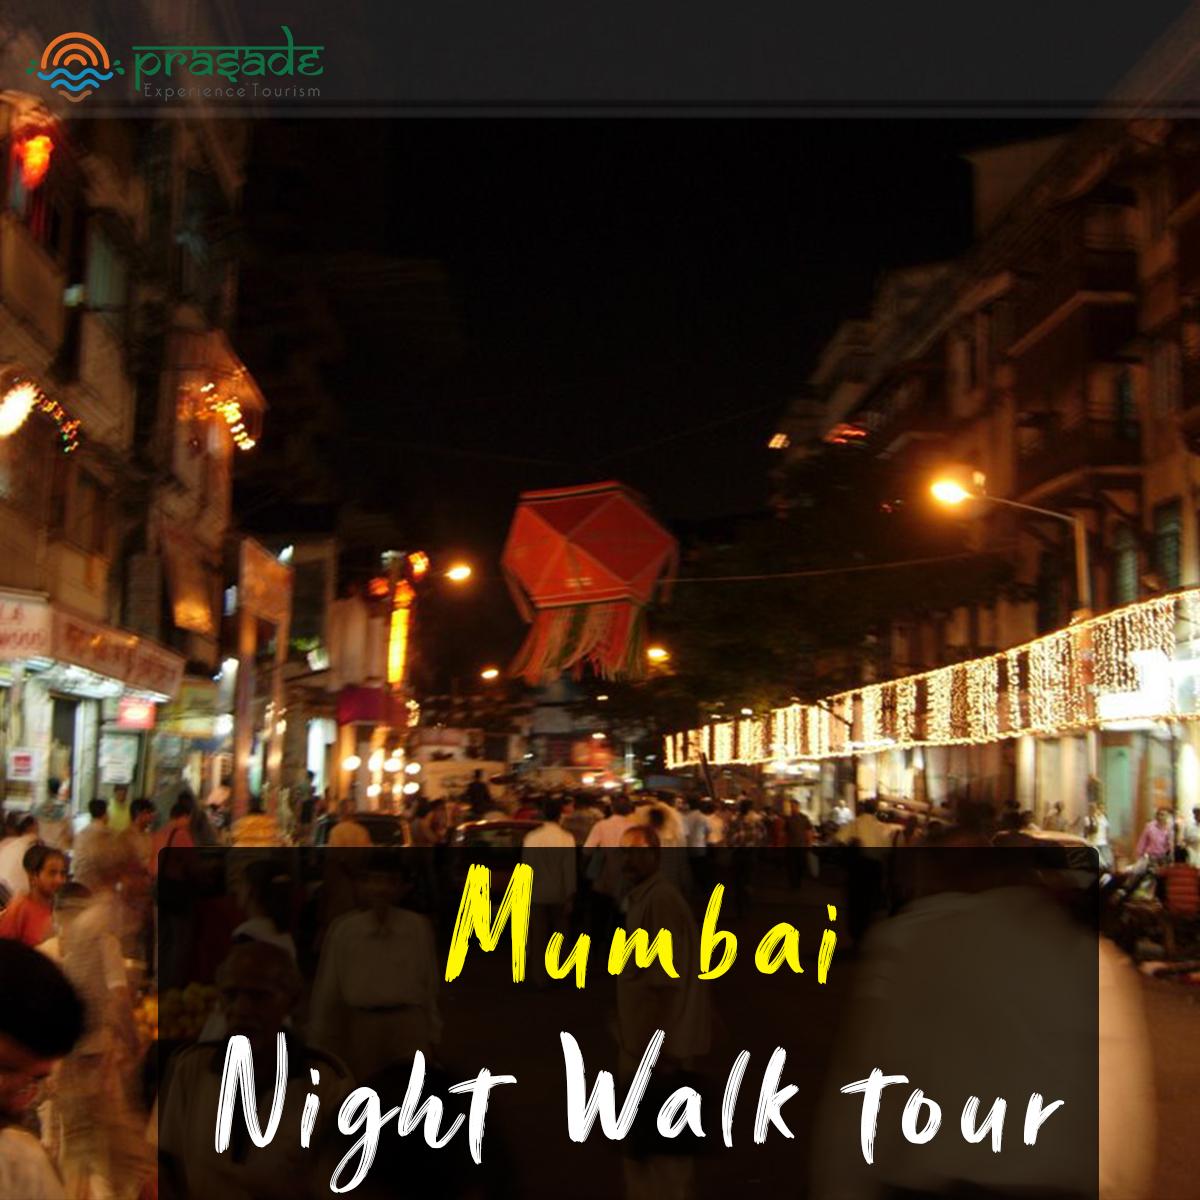 #exploreworld #mumbainightlife #wanderlusts #indiatourism #indiatravel #indiatravelgram #loveindia #bucketlists #travelblogging #travelbloggersindia #wanderers #travelindiapic.twitter.com/h0aqMBcLHJ